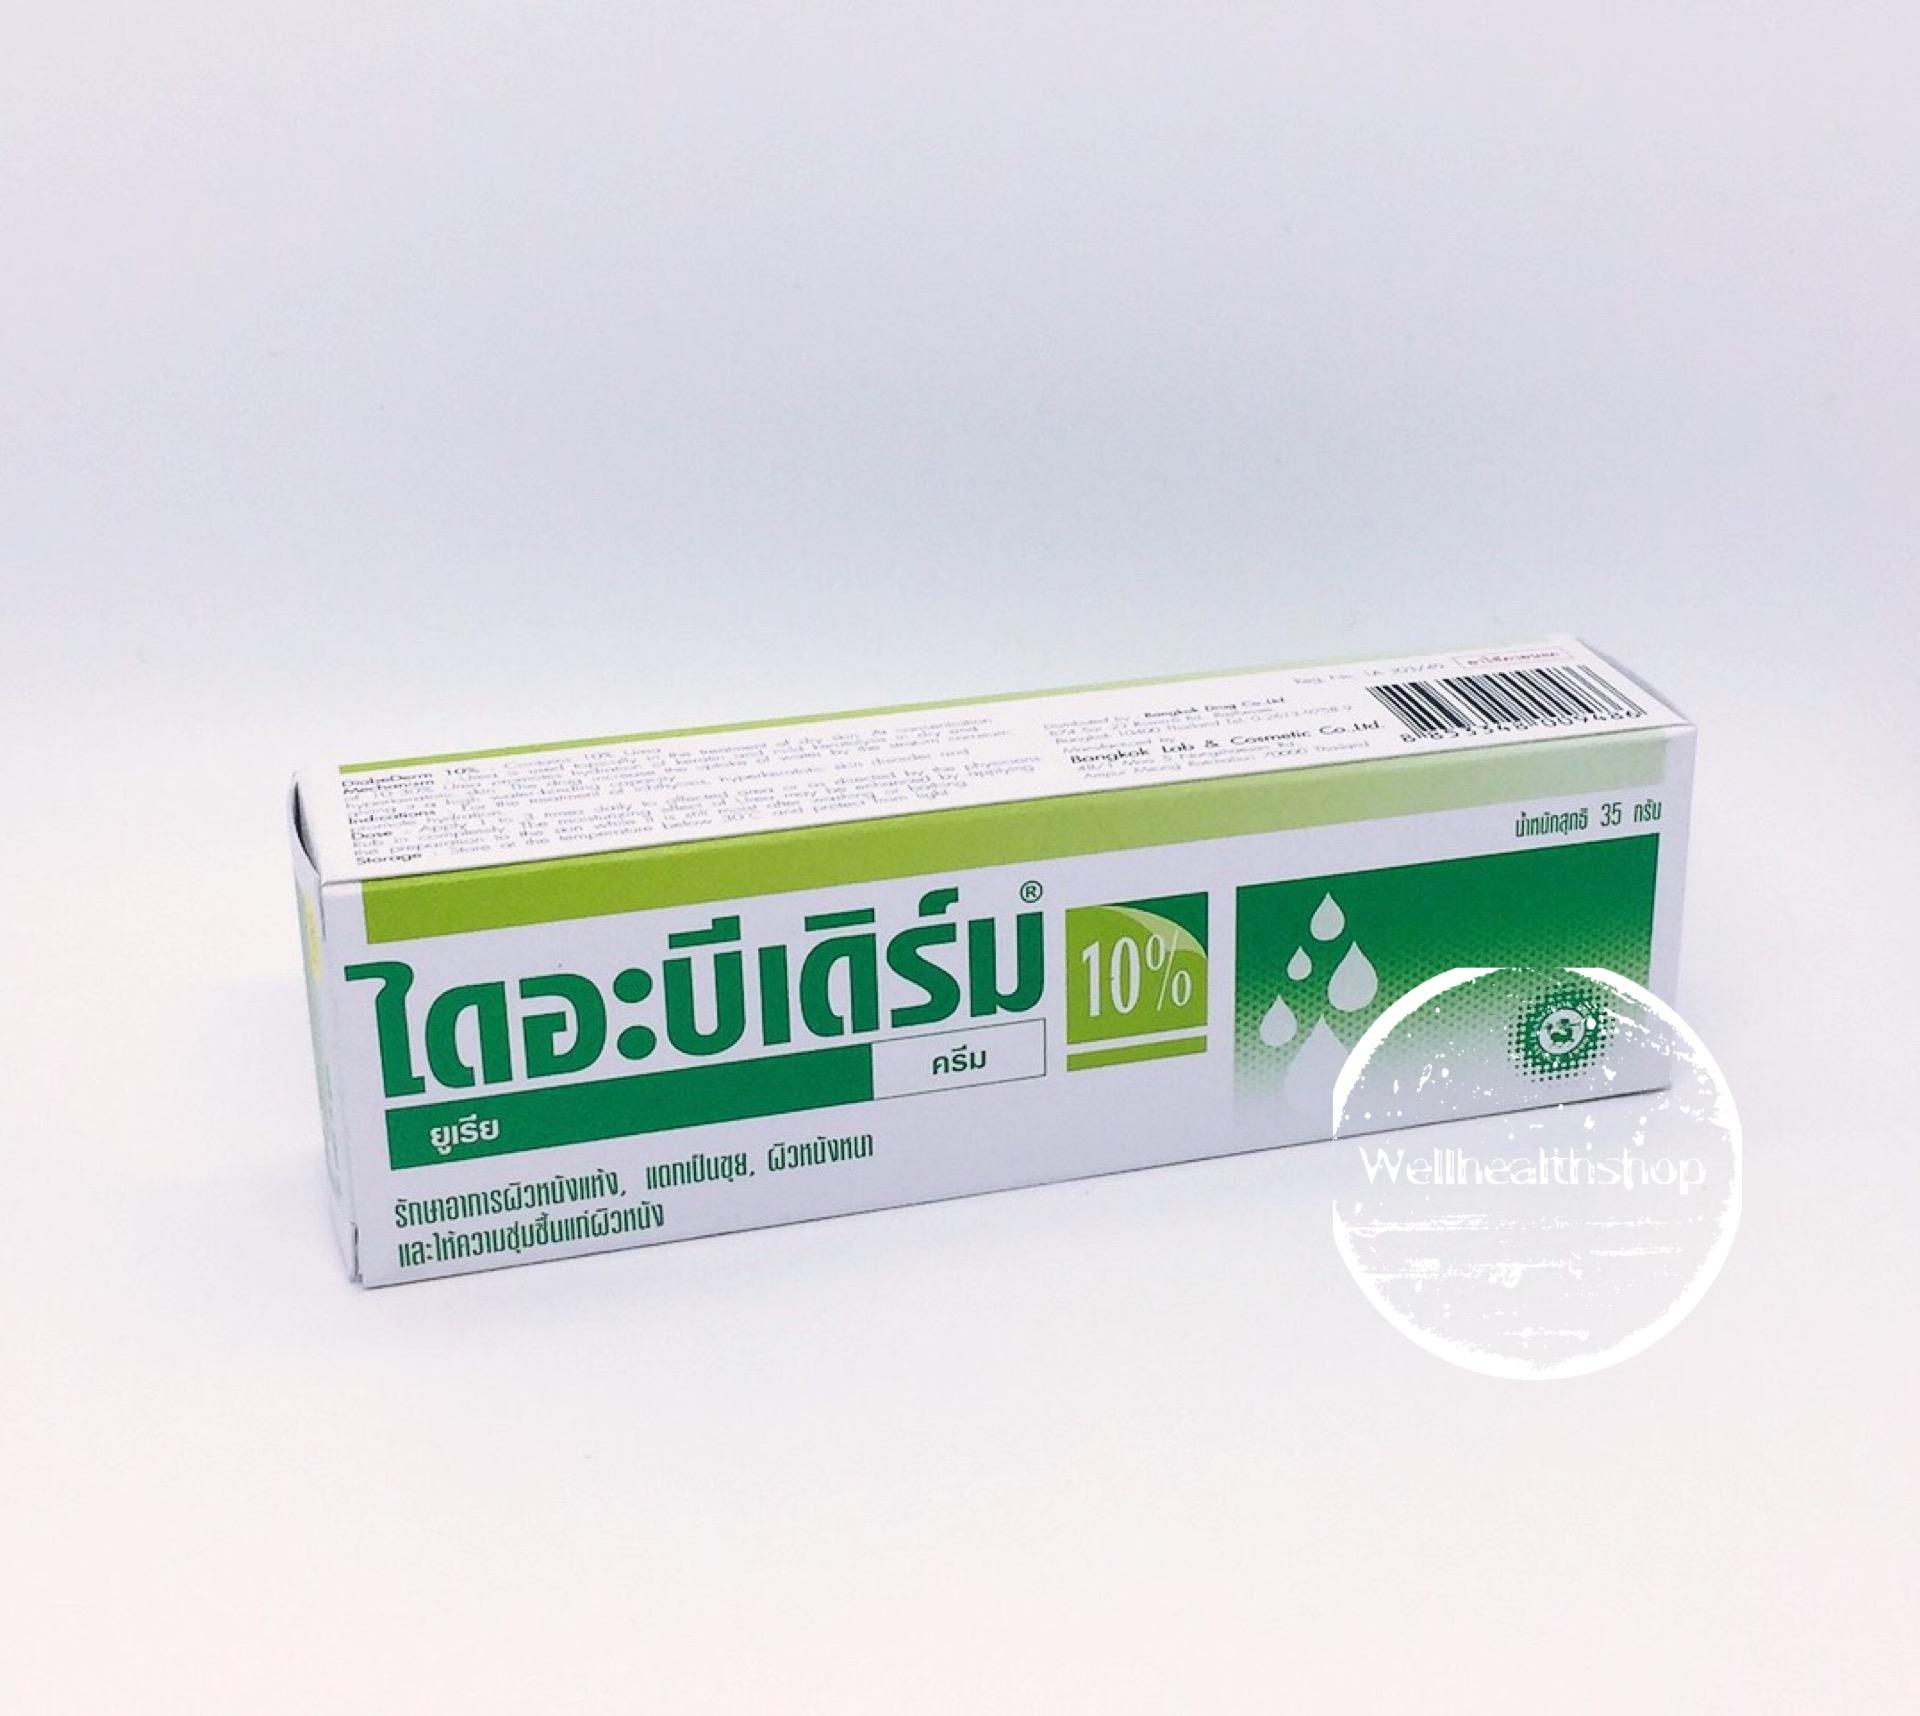 Diabederm Urea Cream 10% ไดอะบีเดิร์ม ยูเรีย ครีม 10%